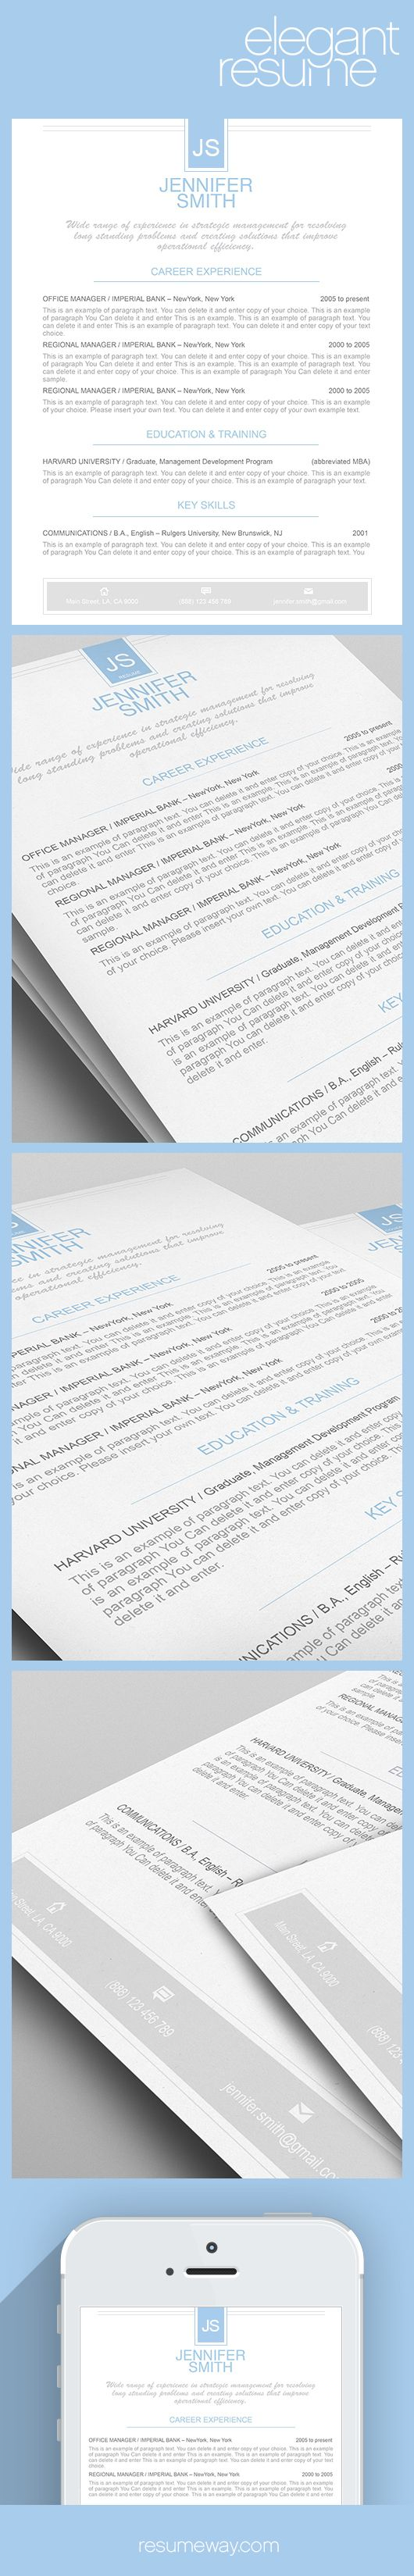 elegant resume template 110430 premium line of resume cover elegant resume template 110430 premium line of resume cover letter templates easy edit